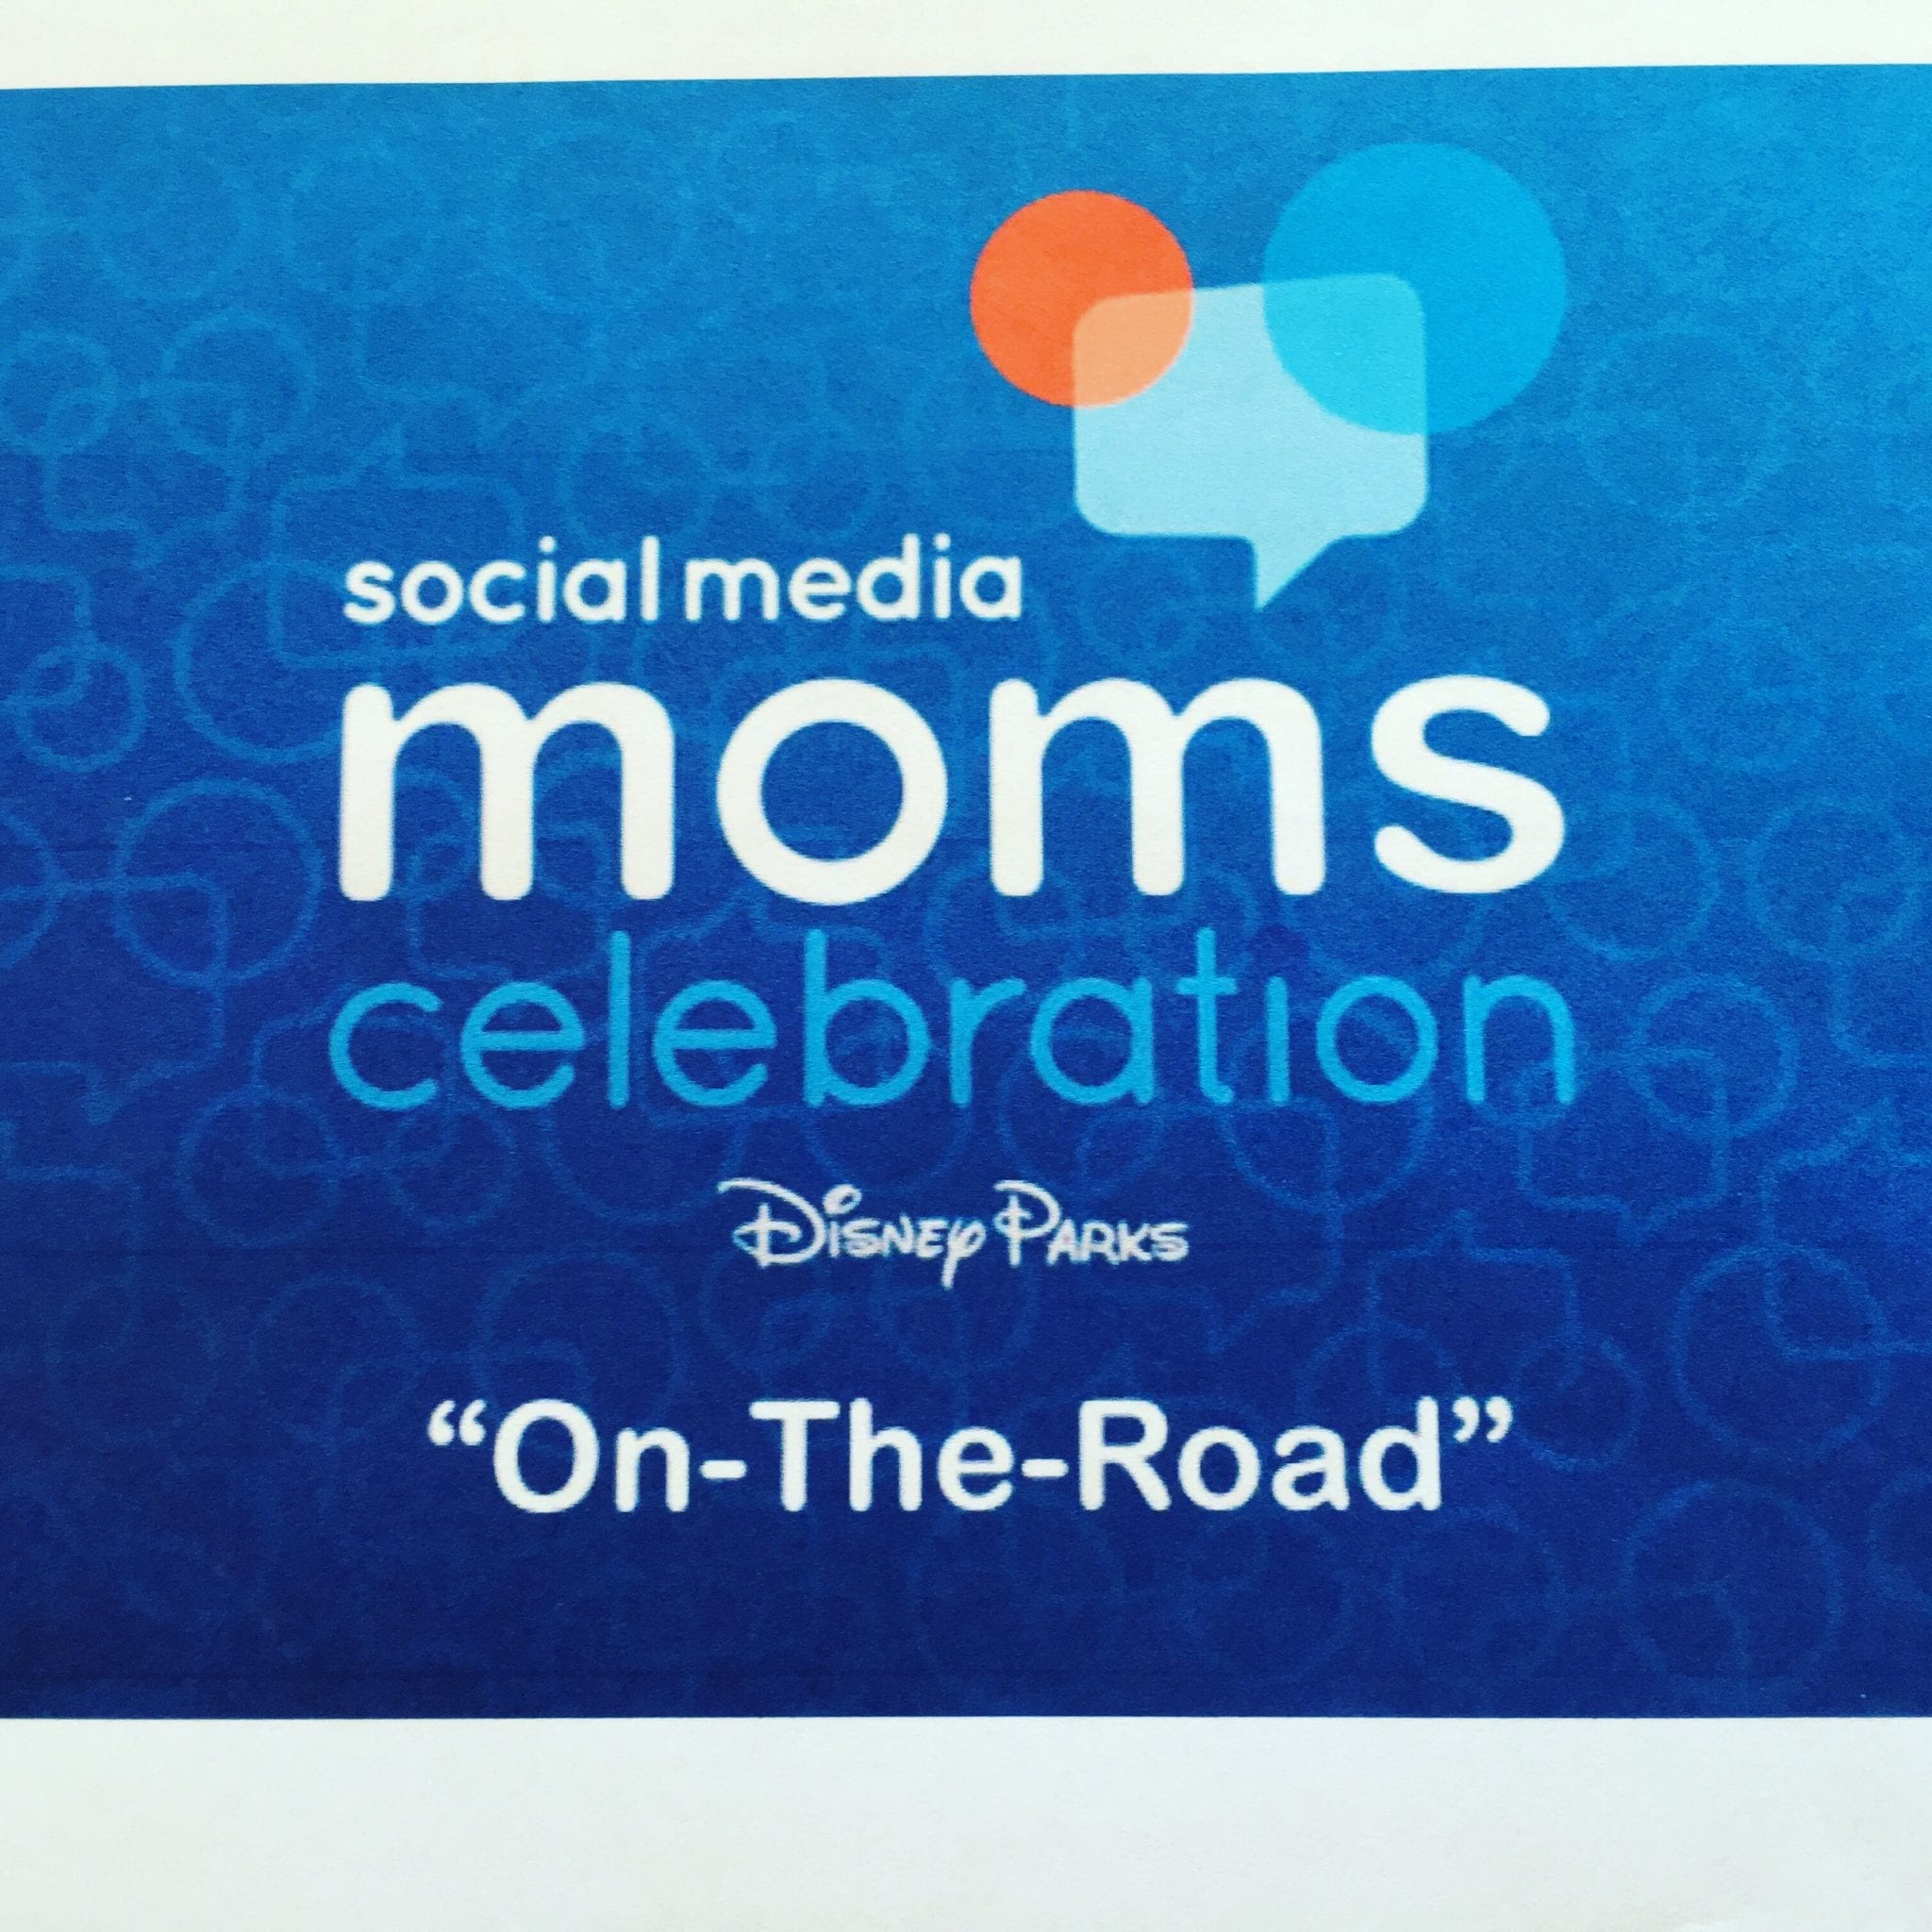 @DisneyMoms Social Media Moms Celebration! #disneysmmcdlr #disneysmmc